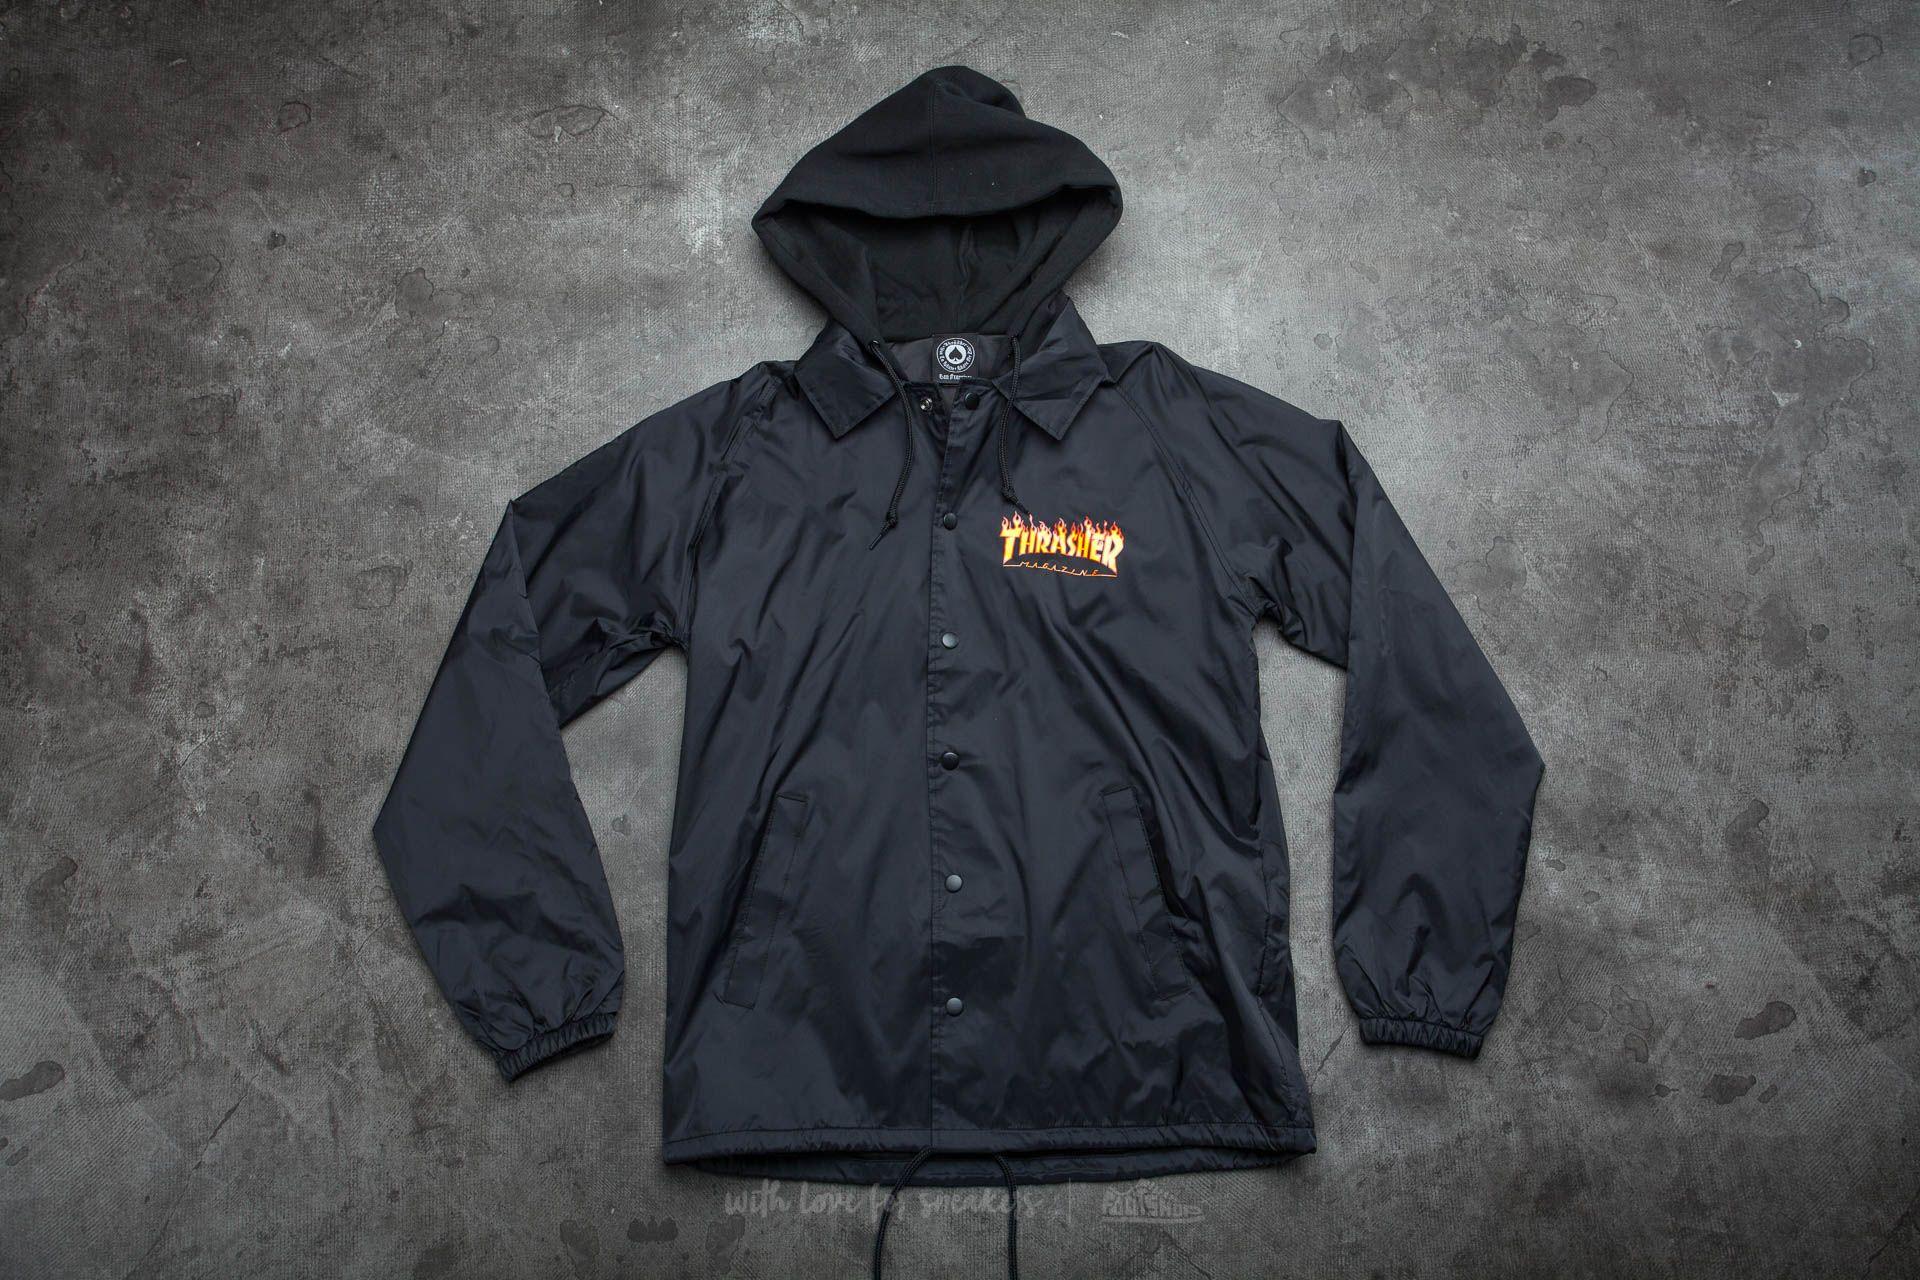 de2d32a4 Thrasher Flame Logo Coach Jacket With Fleece Hoodie Black | Footshop